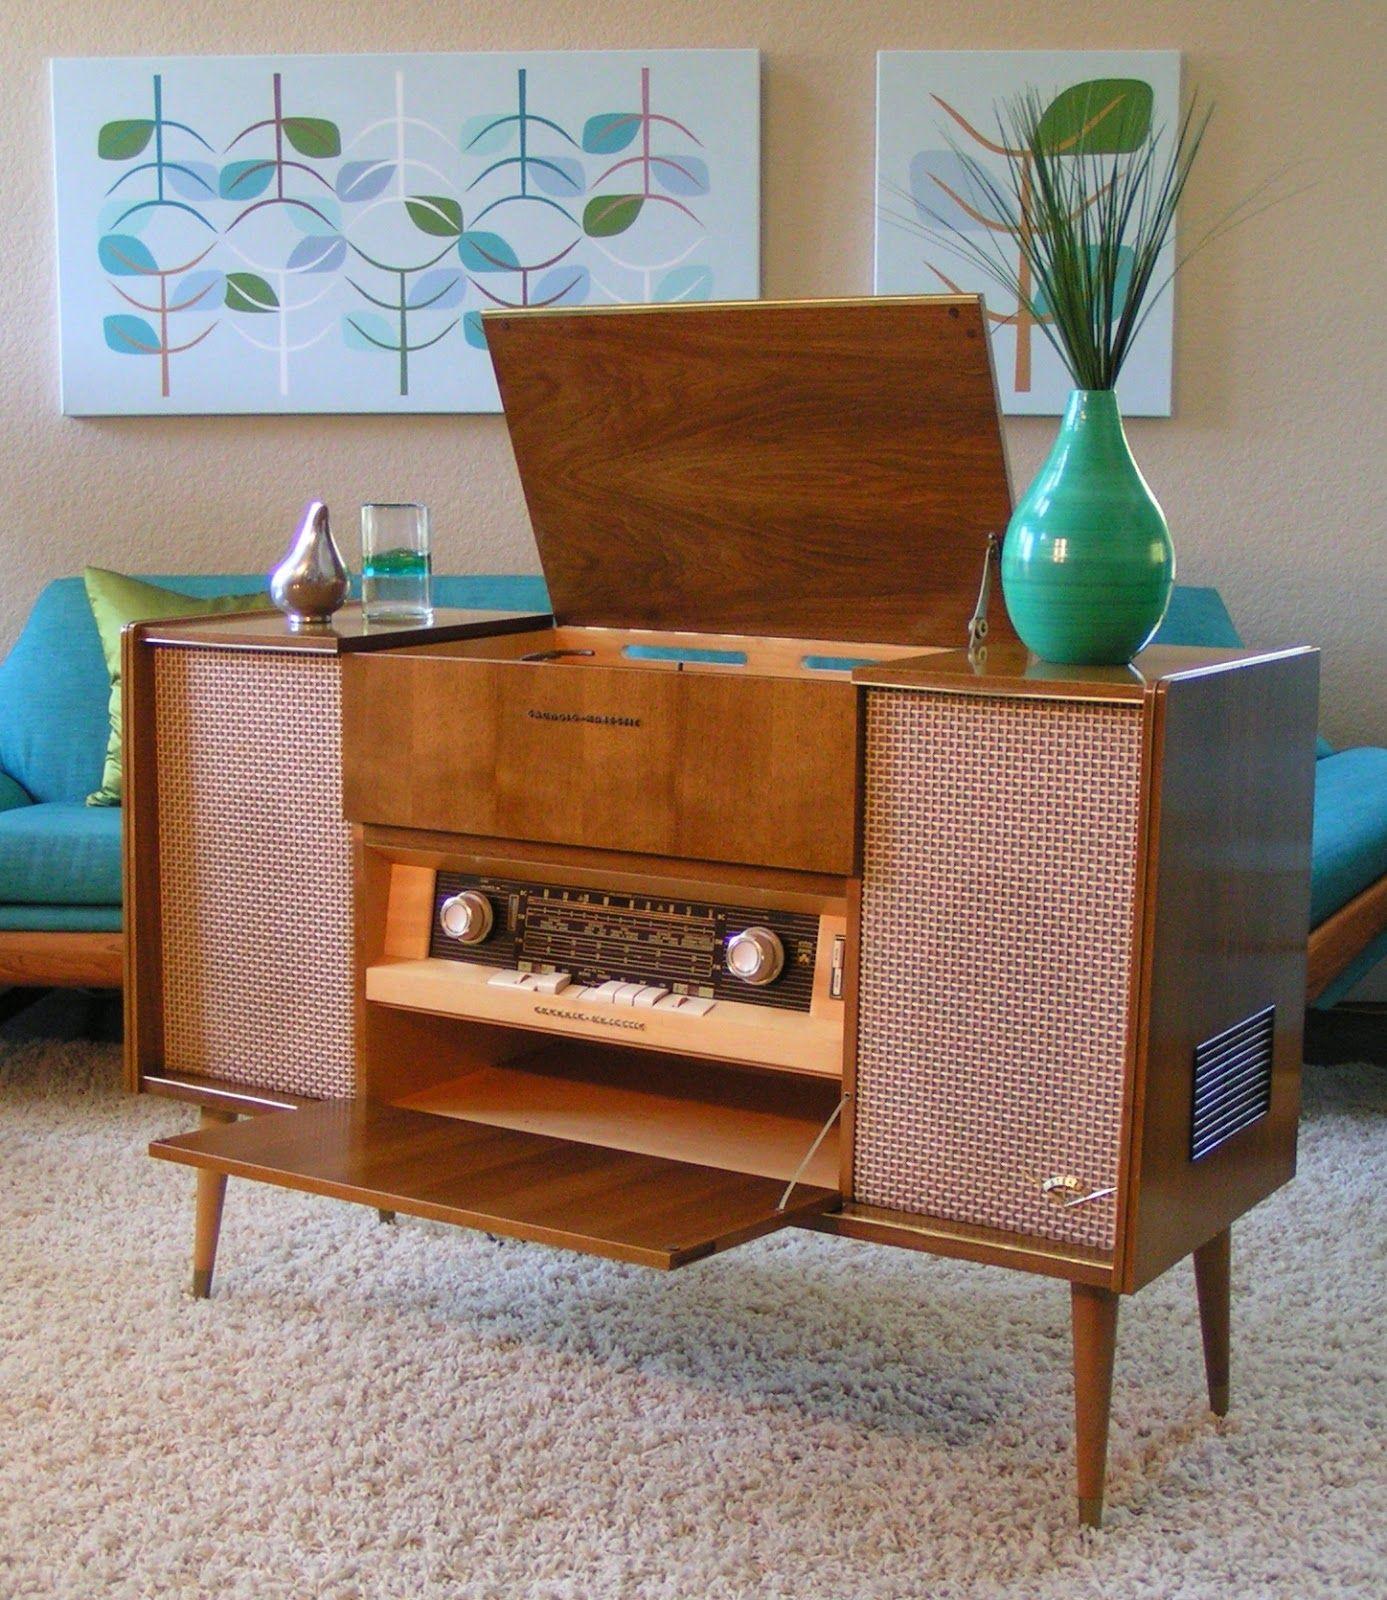 1961 grundig majestic stereo console so 122us vintage pinterest audio muebles auxiliares. Black Bedroom Furniture Sets. Home Design Ideas